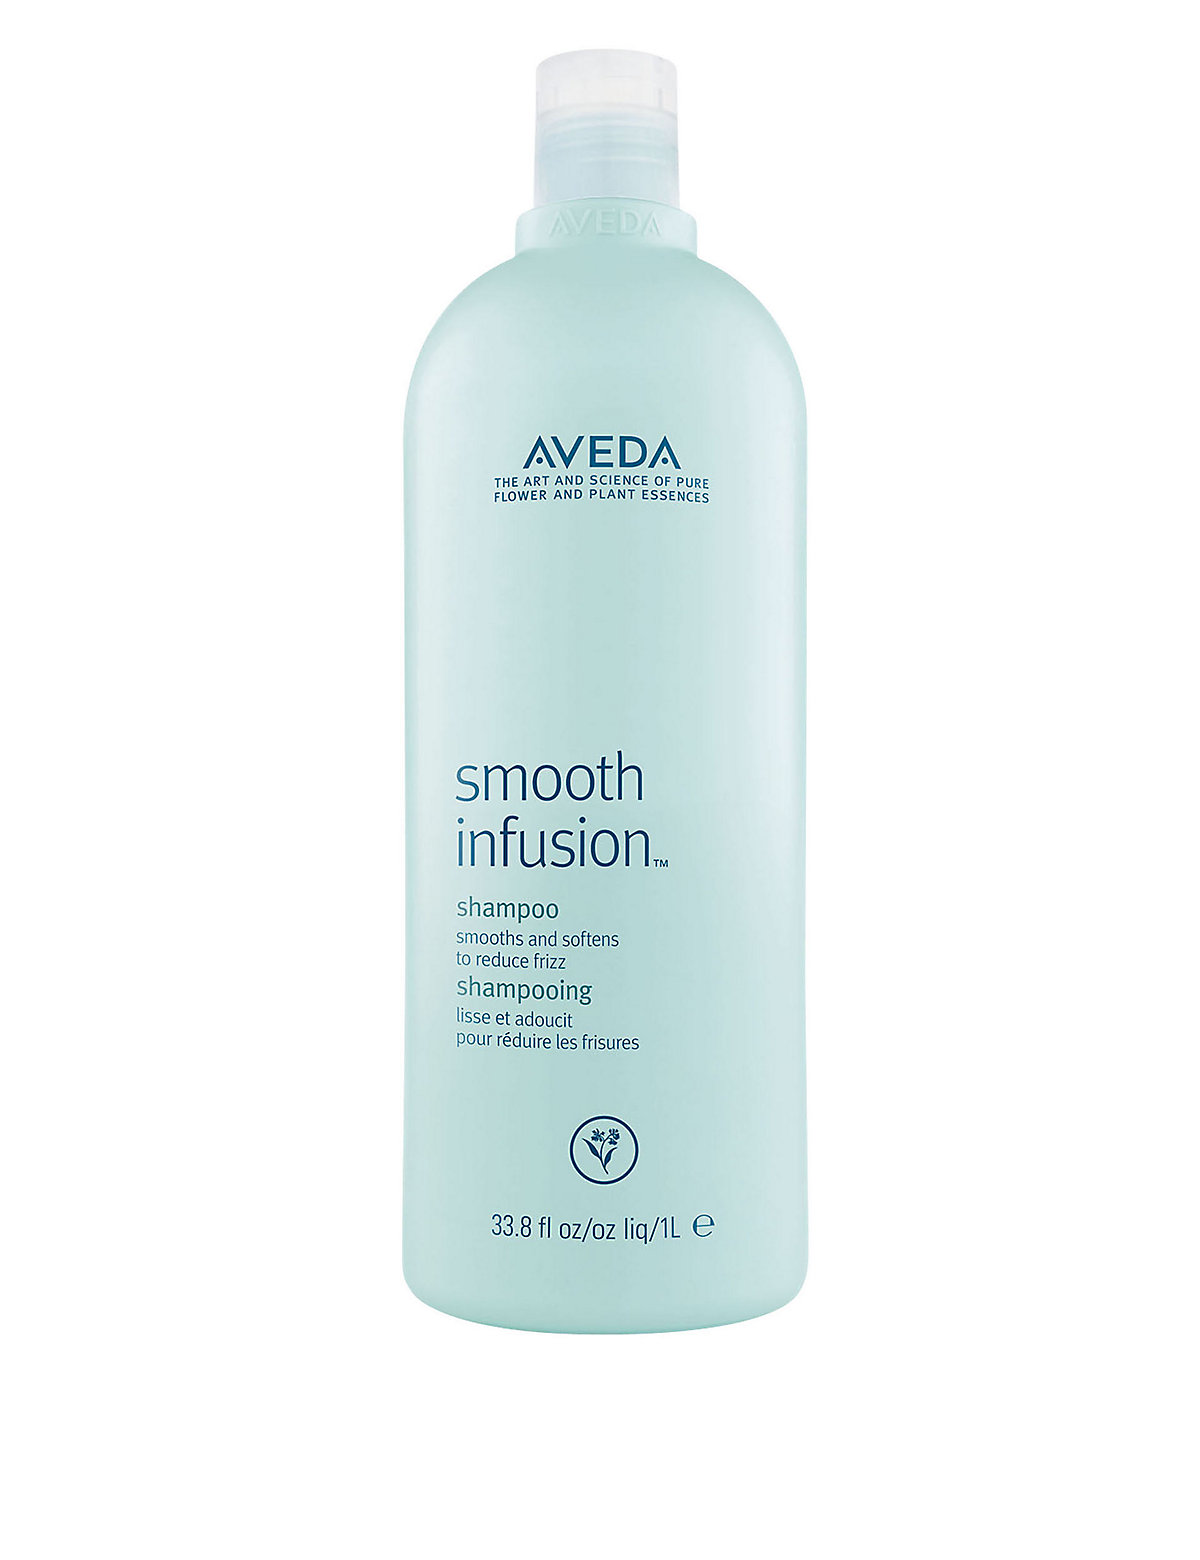 AVEDA 1 Litre Smooth Infusion Shampoo - *Save 25% per ml